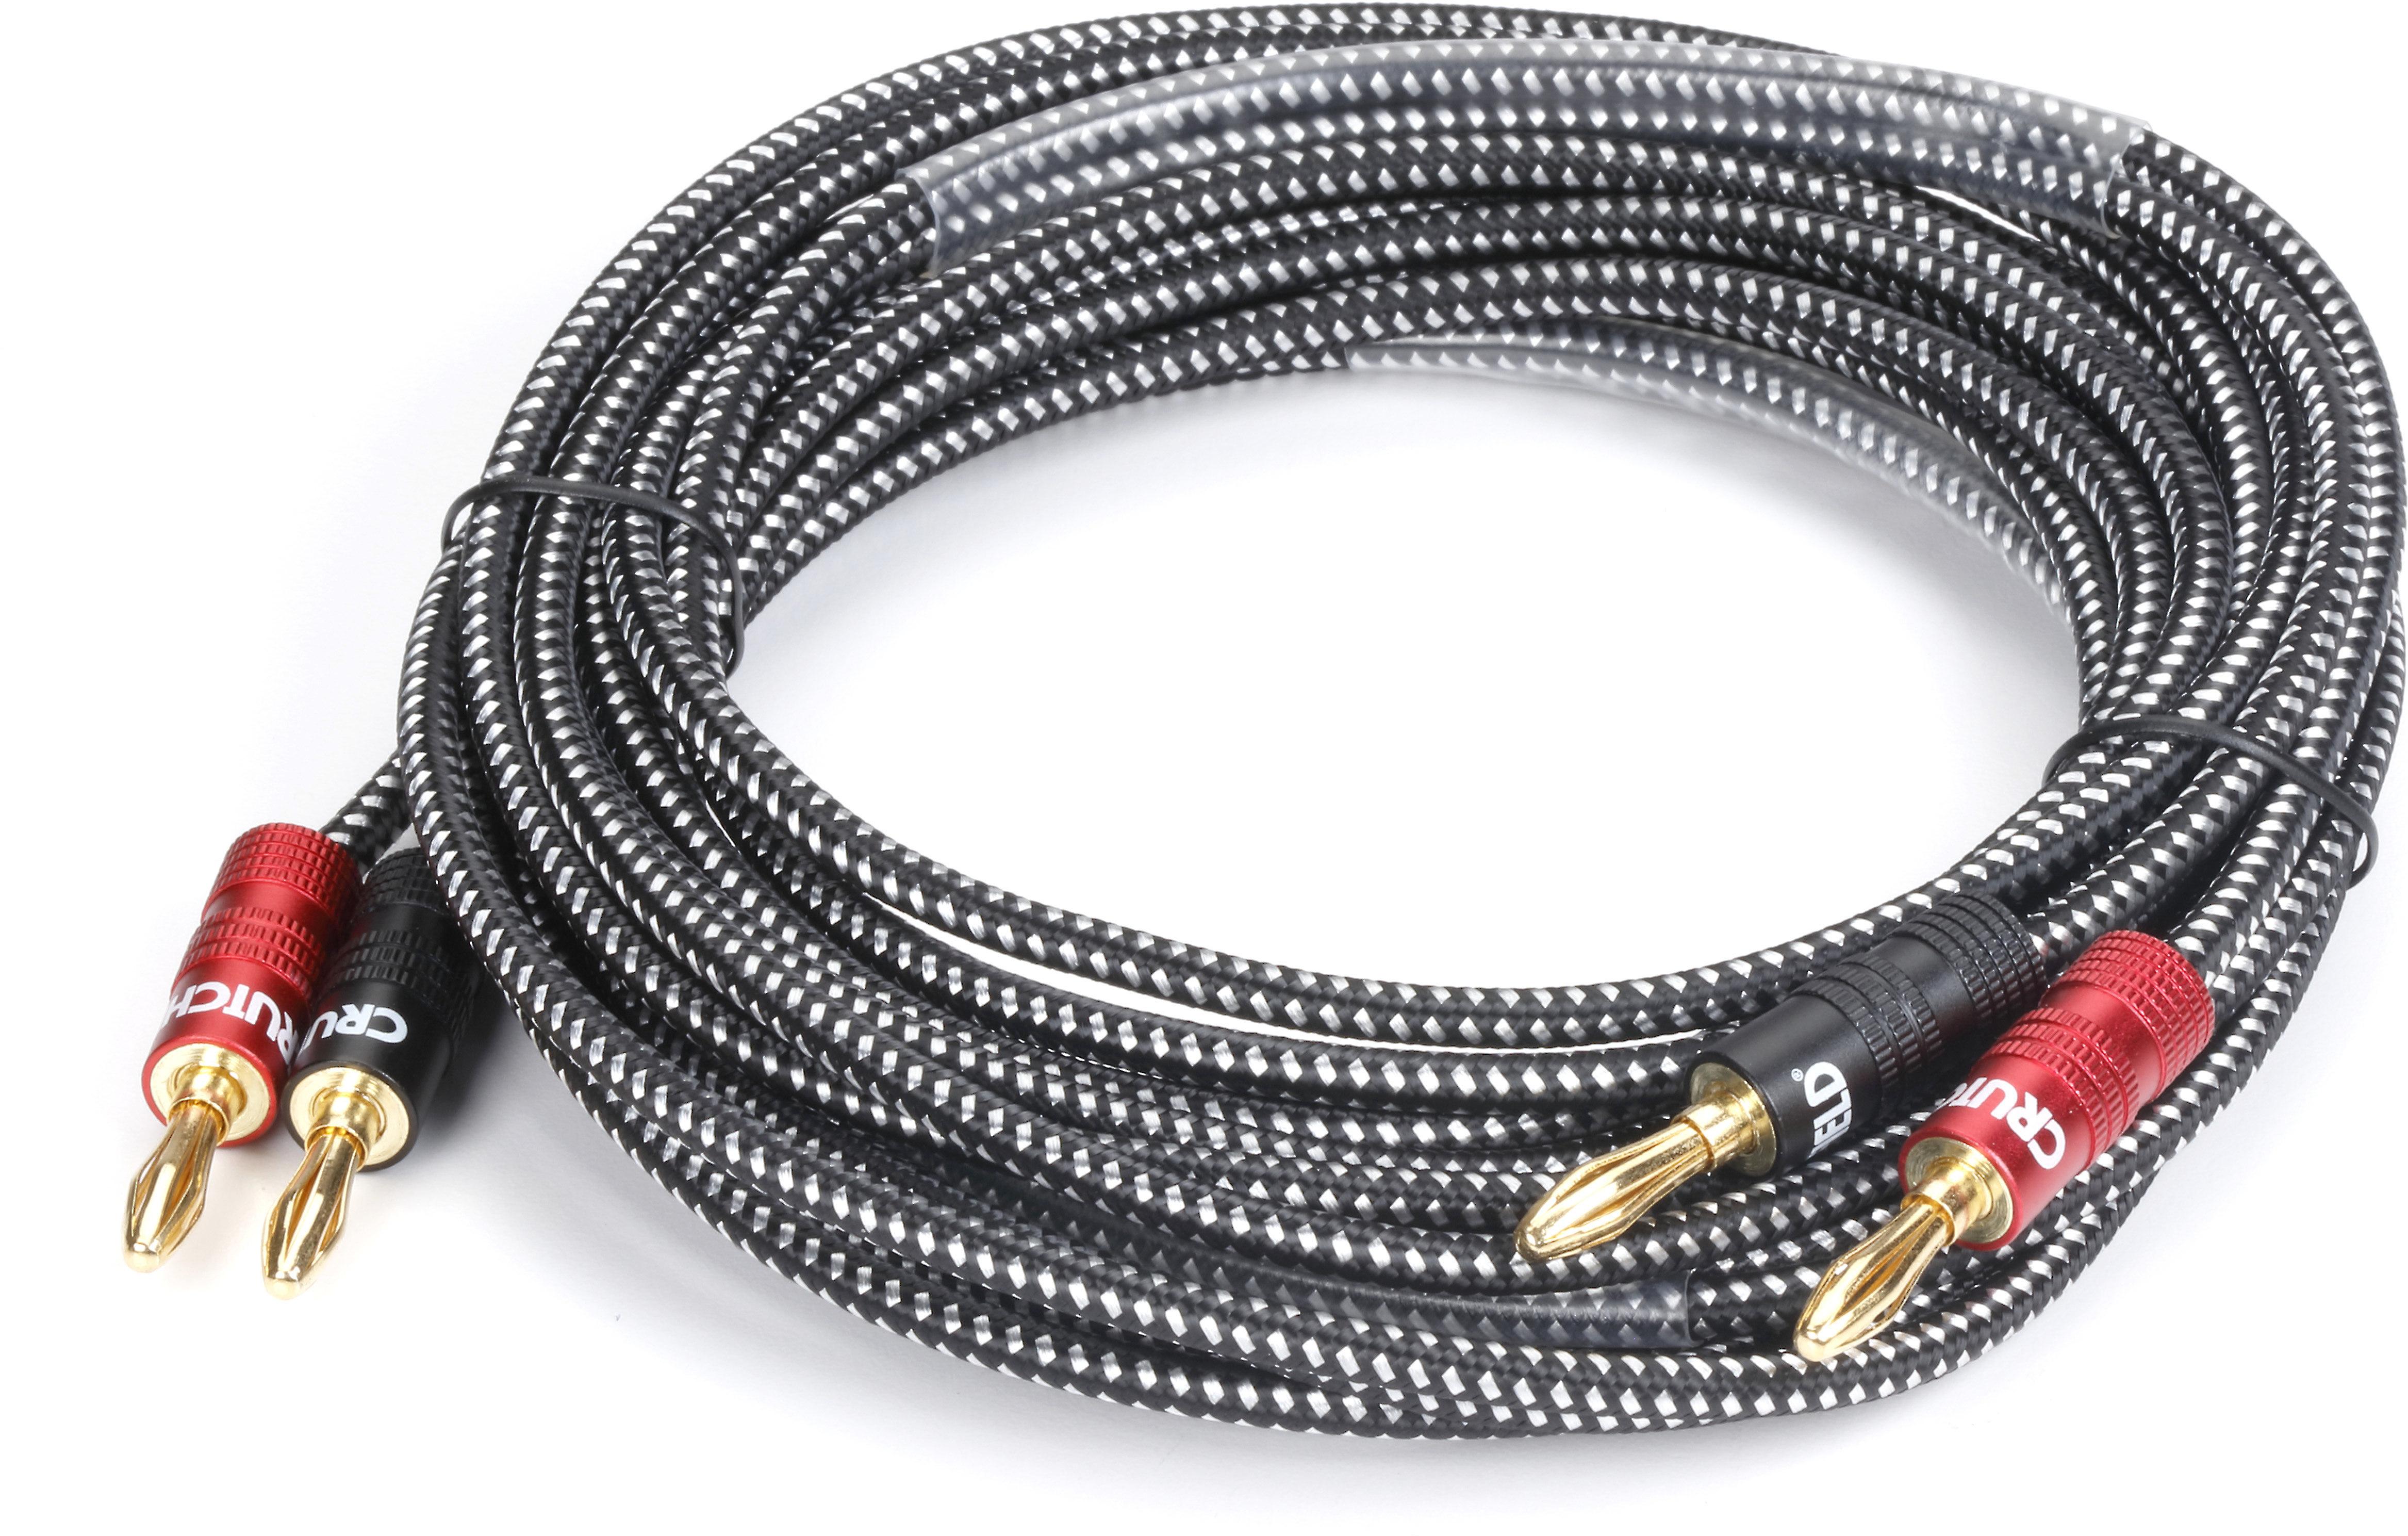 Crutchfield Speaker Wire (9 feet) Single 9-gauge speaker wire with  pre-attached banana plugs at Crutchfield